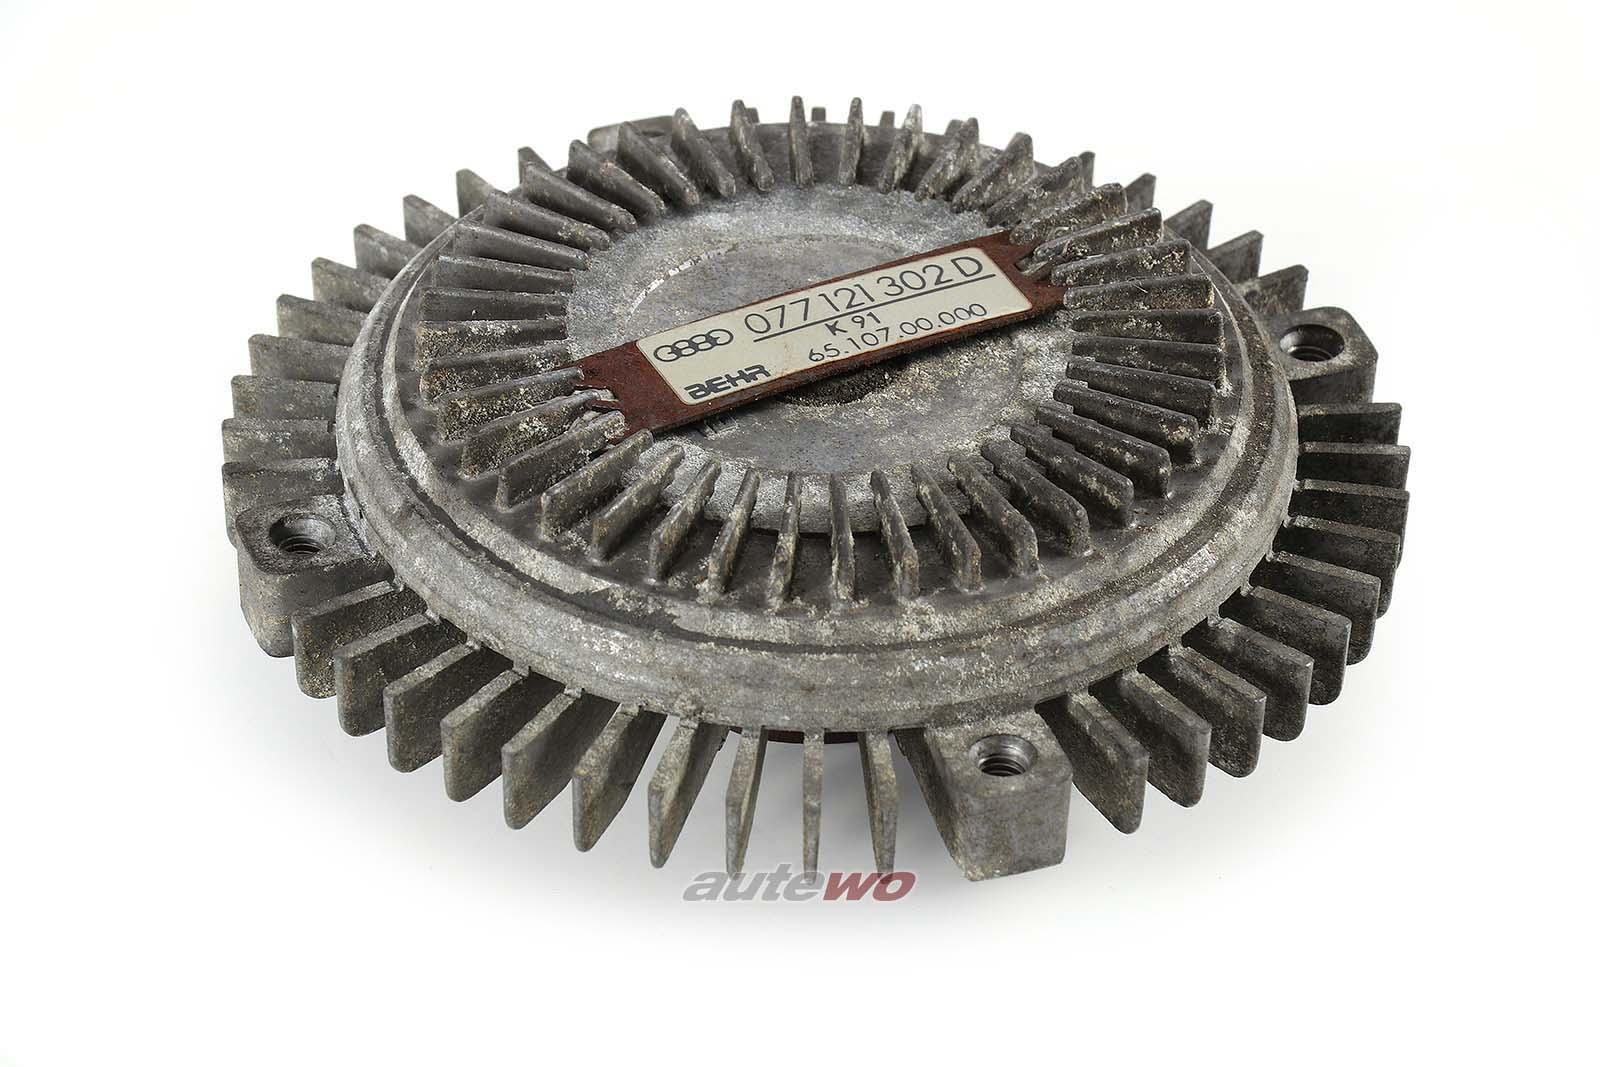 077121302D Audi V8 D11 3.6-4.2l Viskokupplung